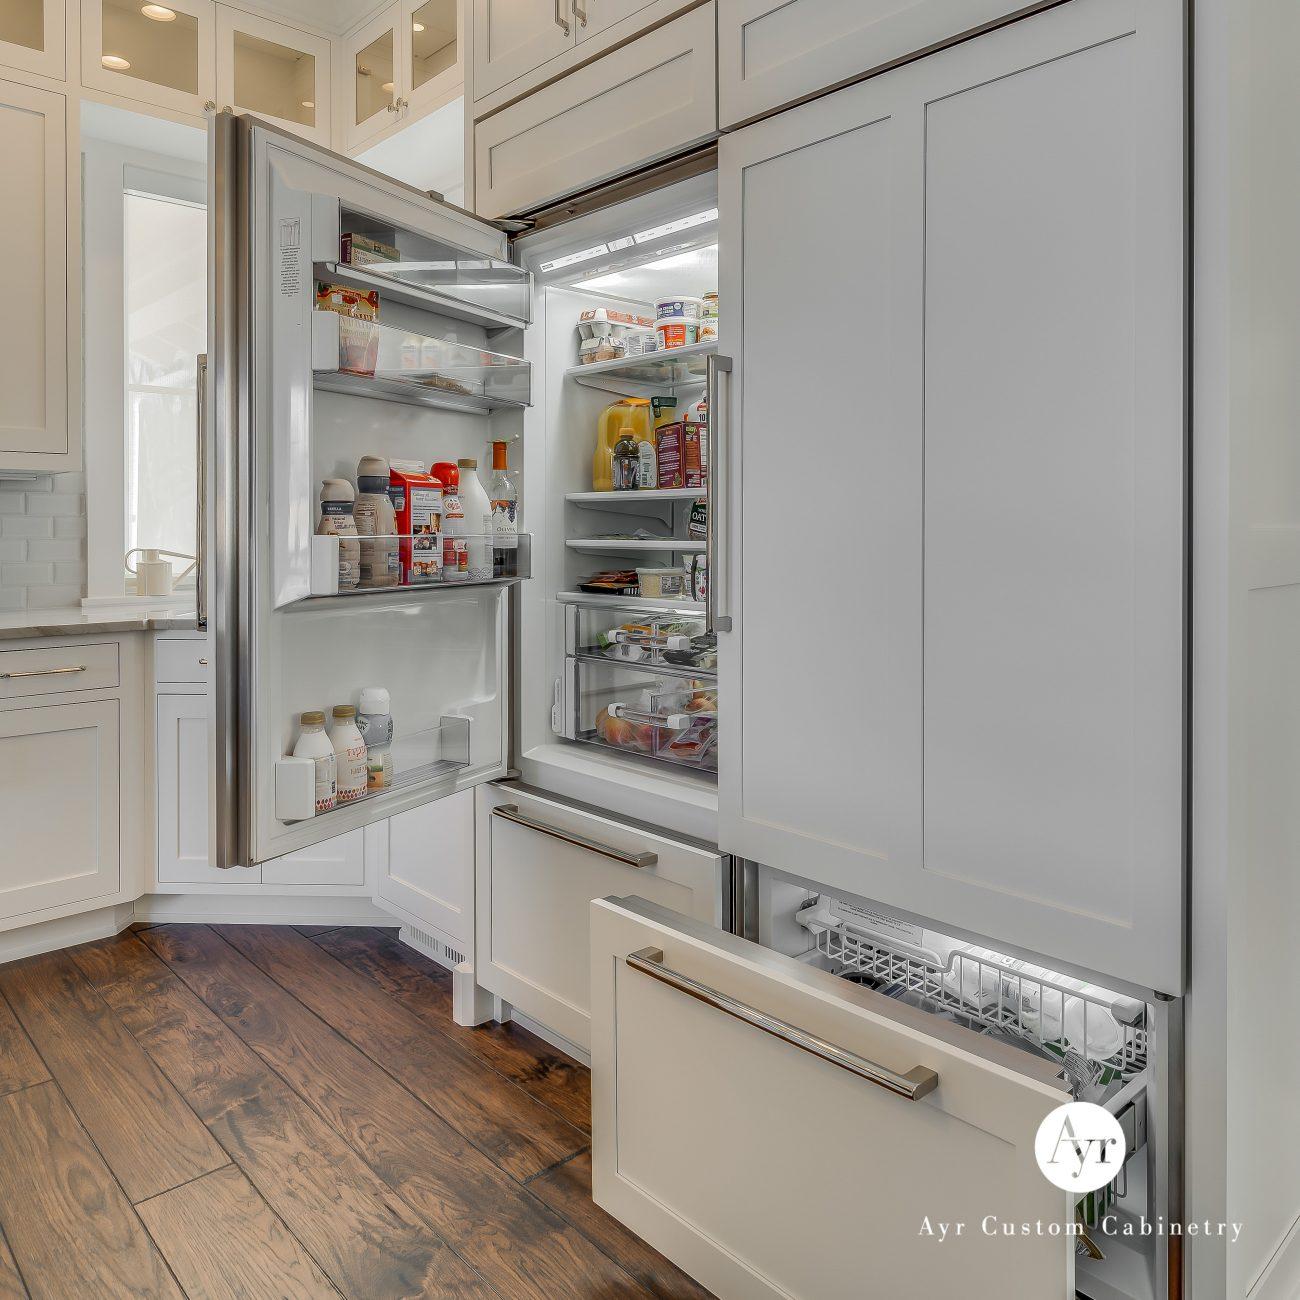 custom kitchen cabinets staley kitchen hidden fridge & freezer